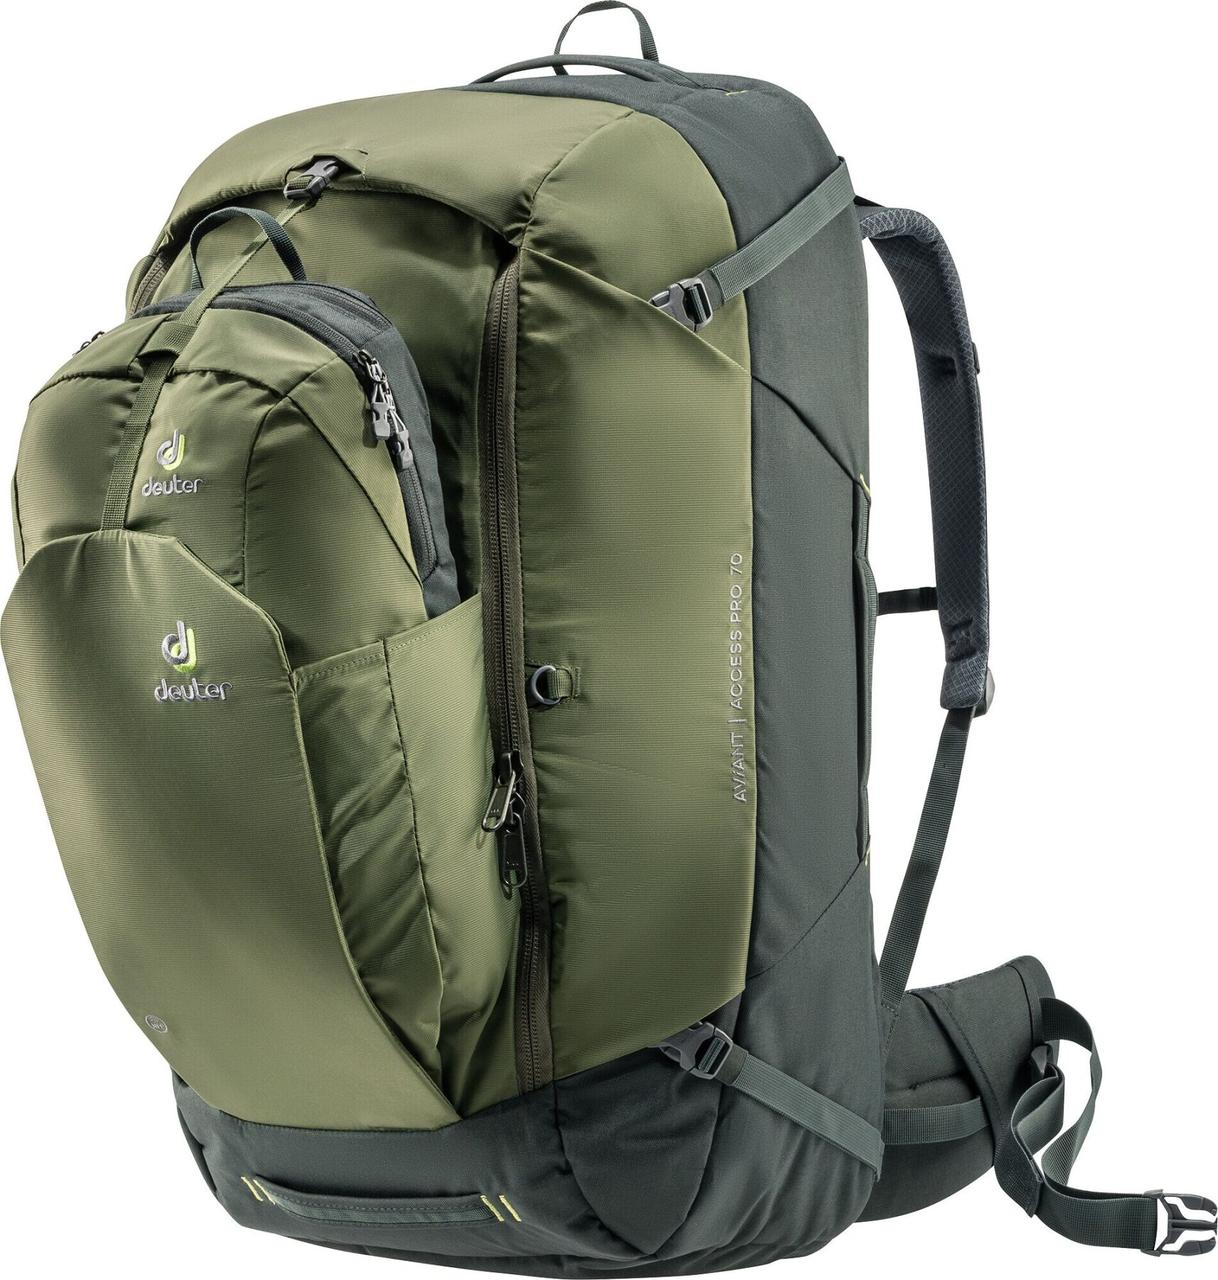 Рюкзак Deuter Aviant Access Pro 70 khaki-ivy (3512220 2243)